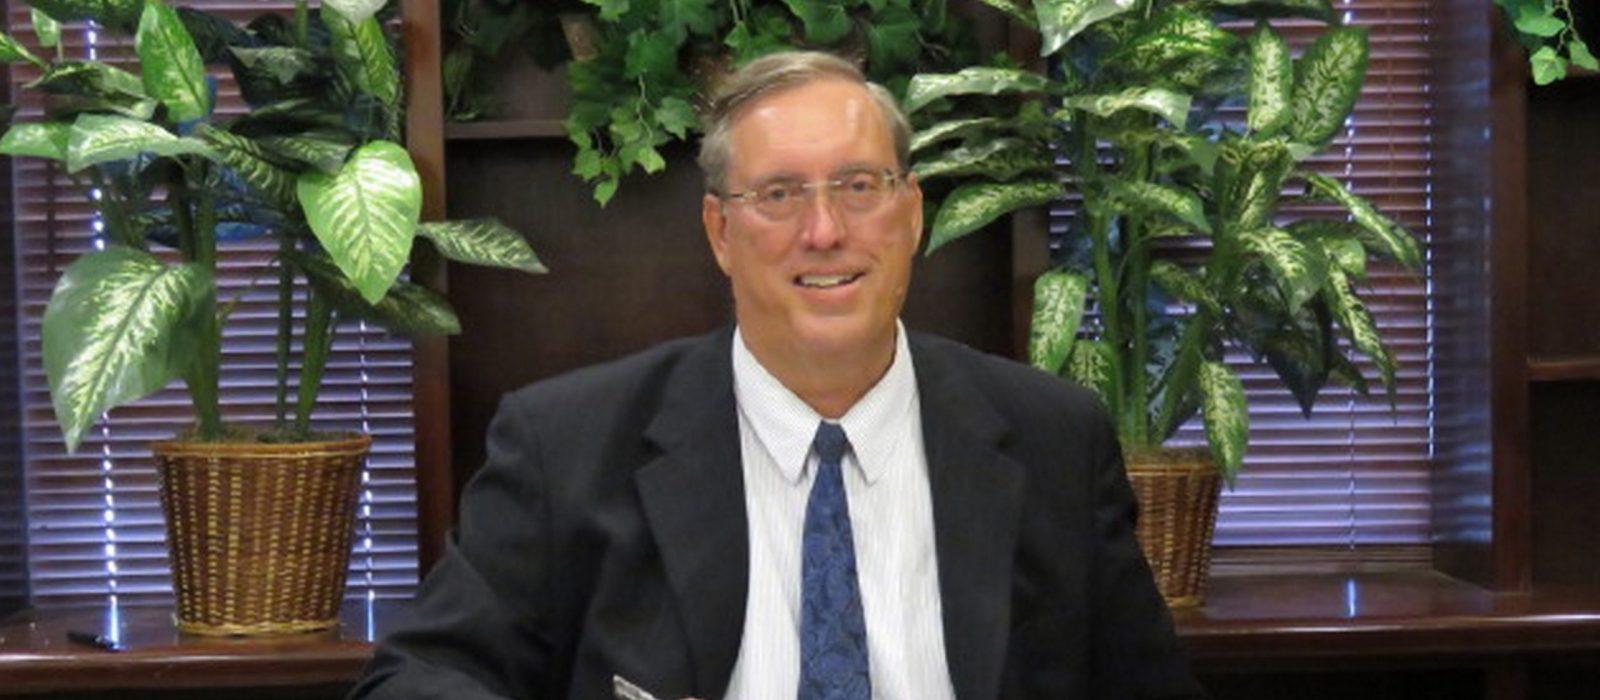 Herbert L. Allen, Jr., P.A. │ Probate Attorney │ 321.779.1211